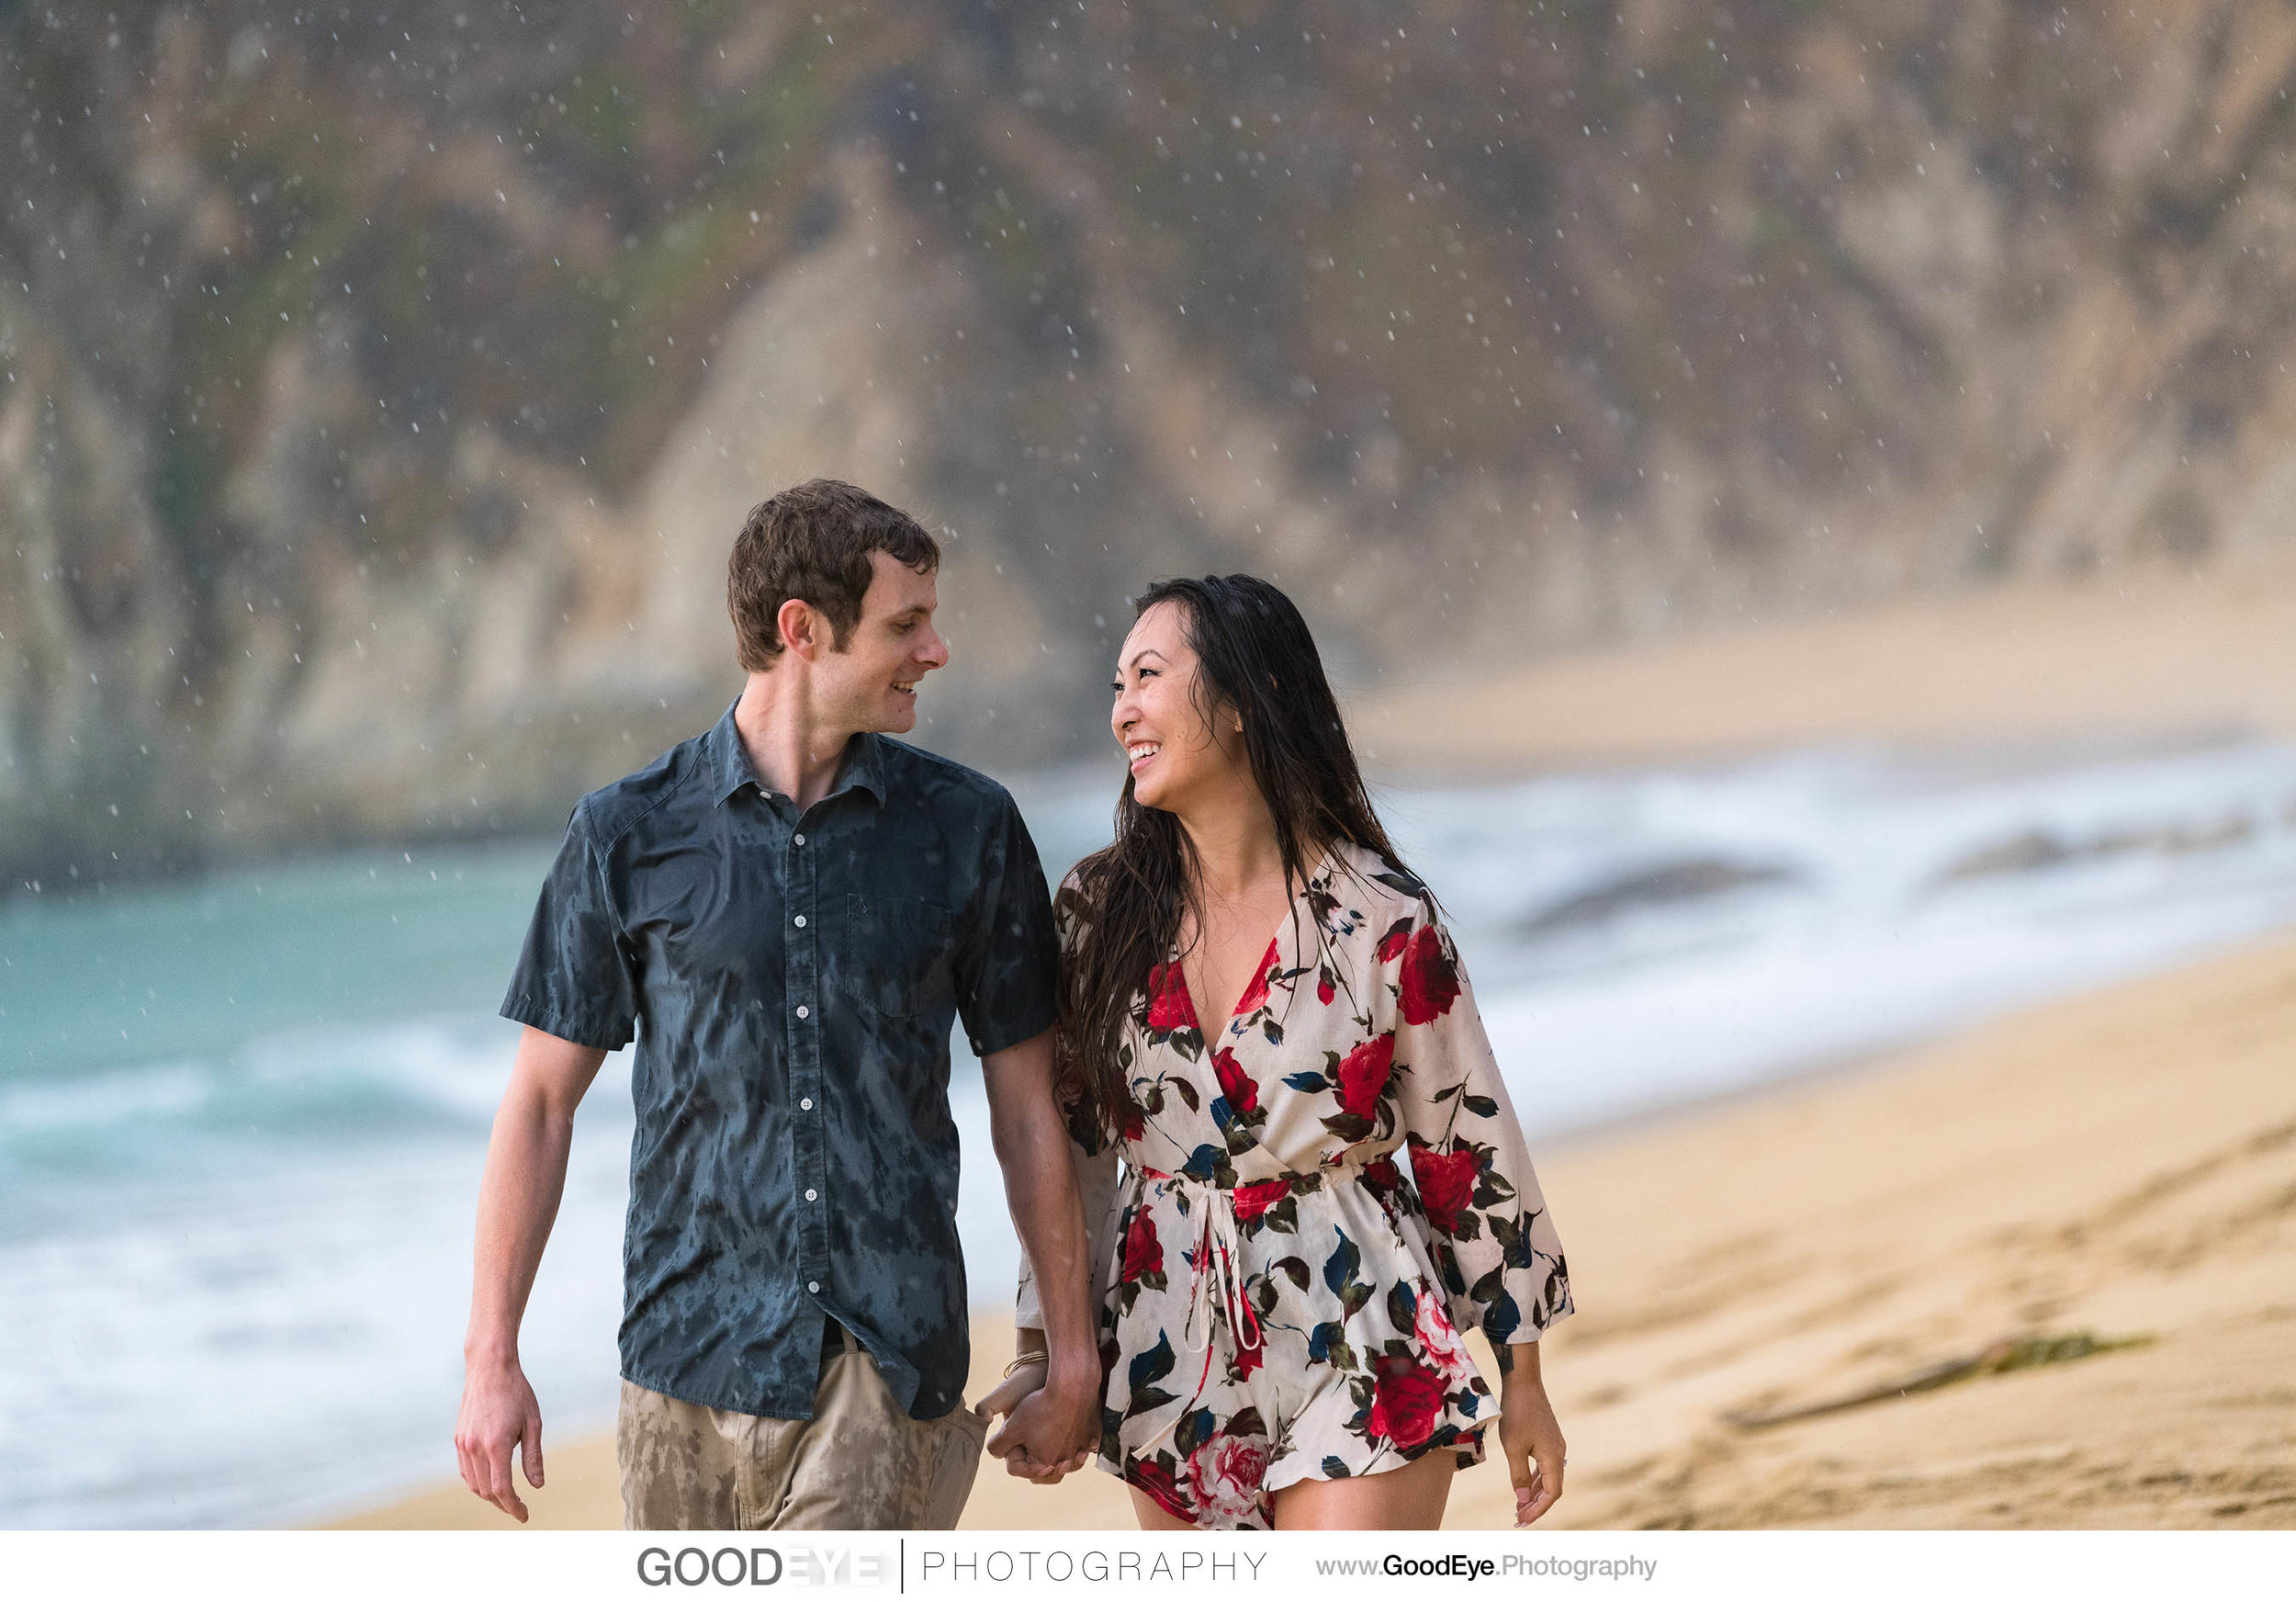 Montara - Gray Whale Cove Engagement Photos in the rain